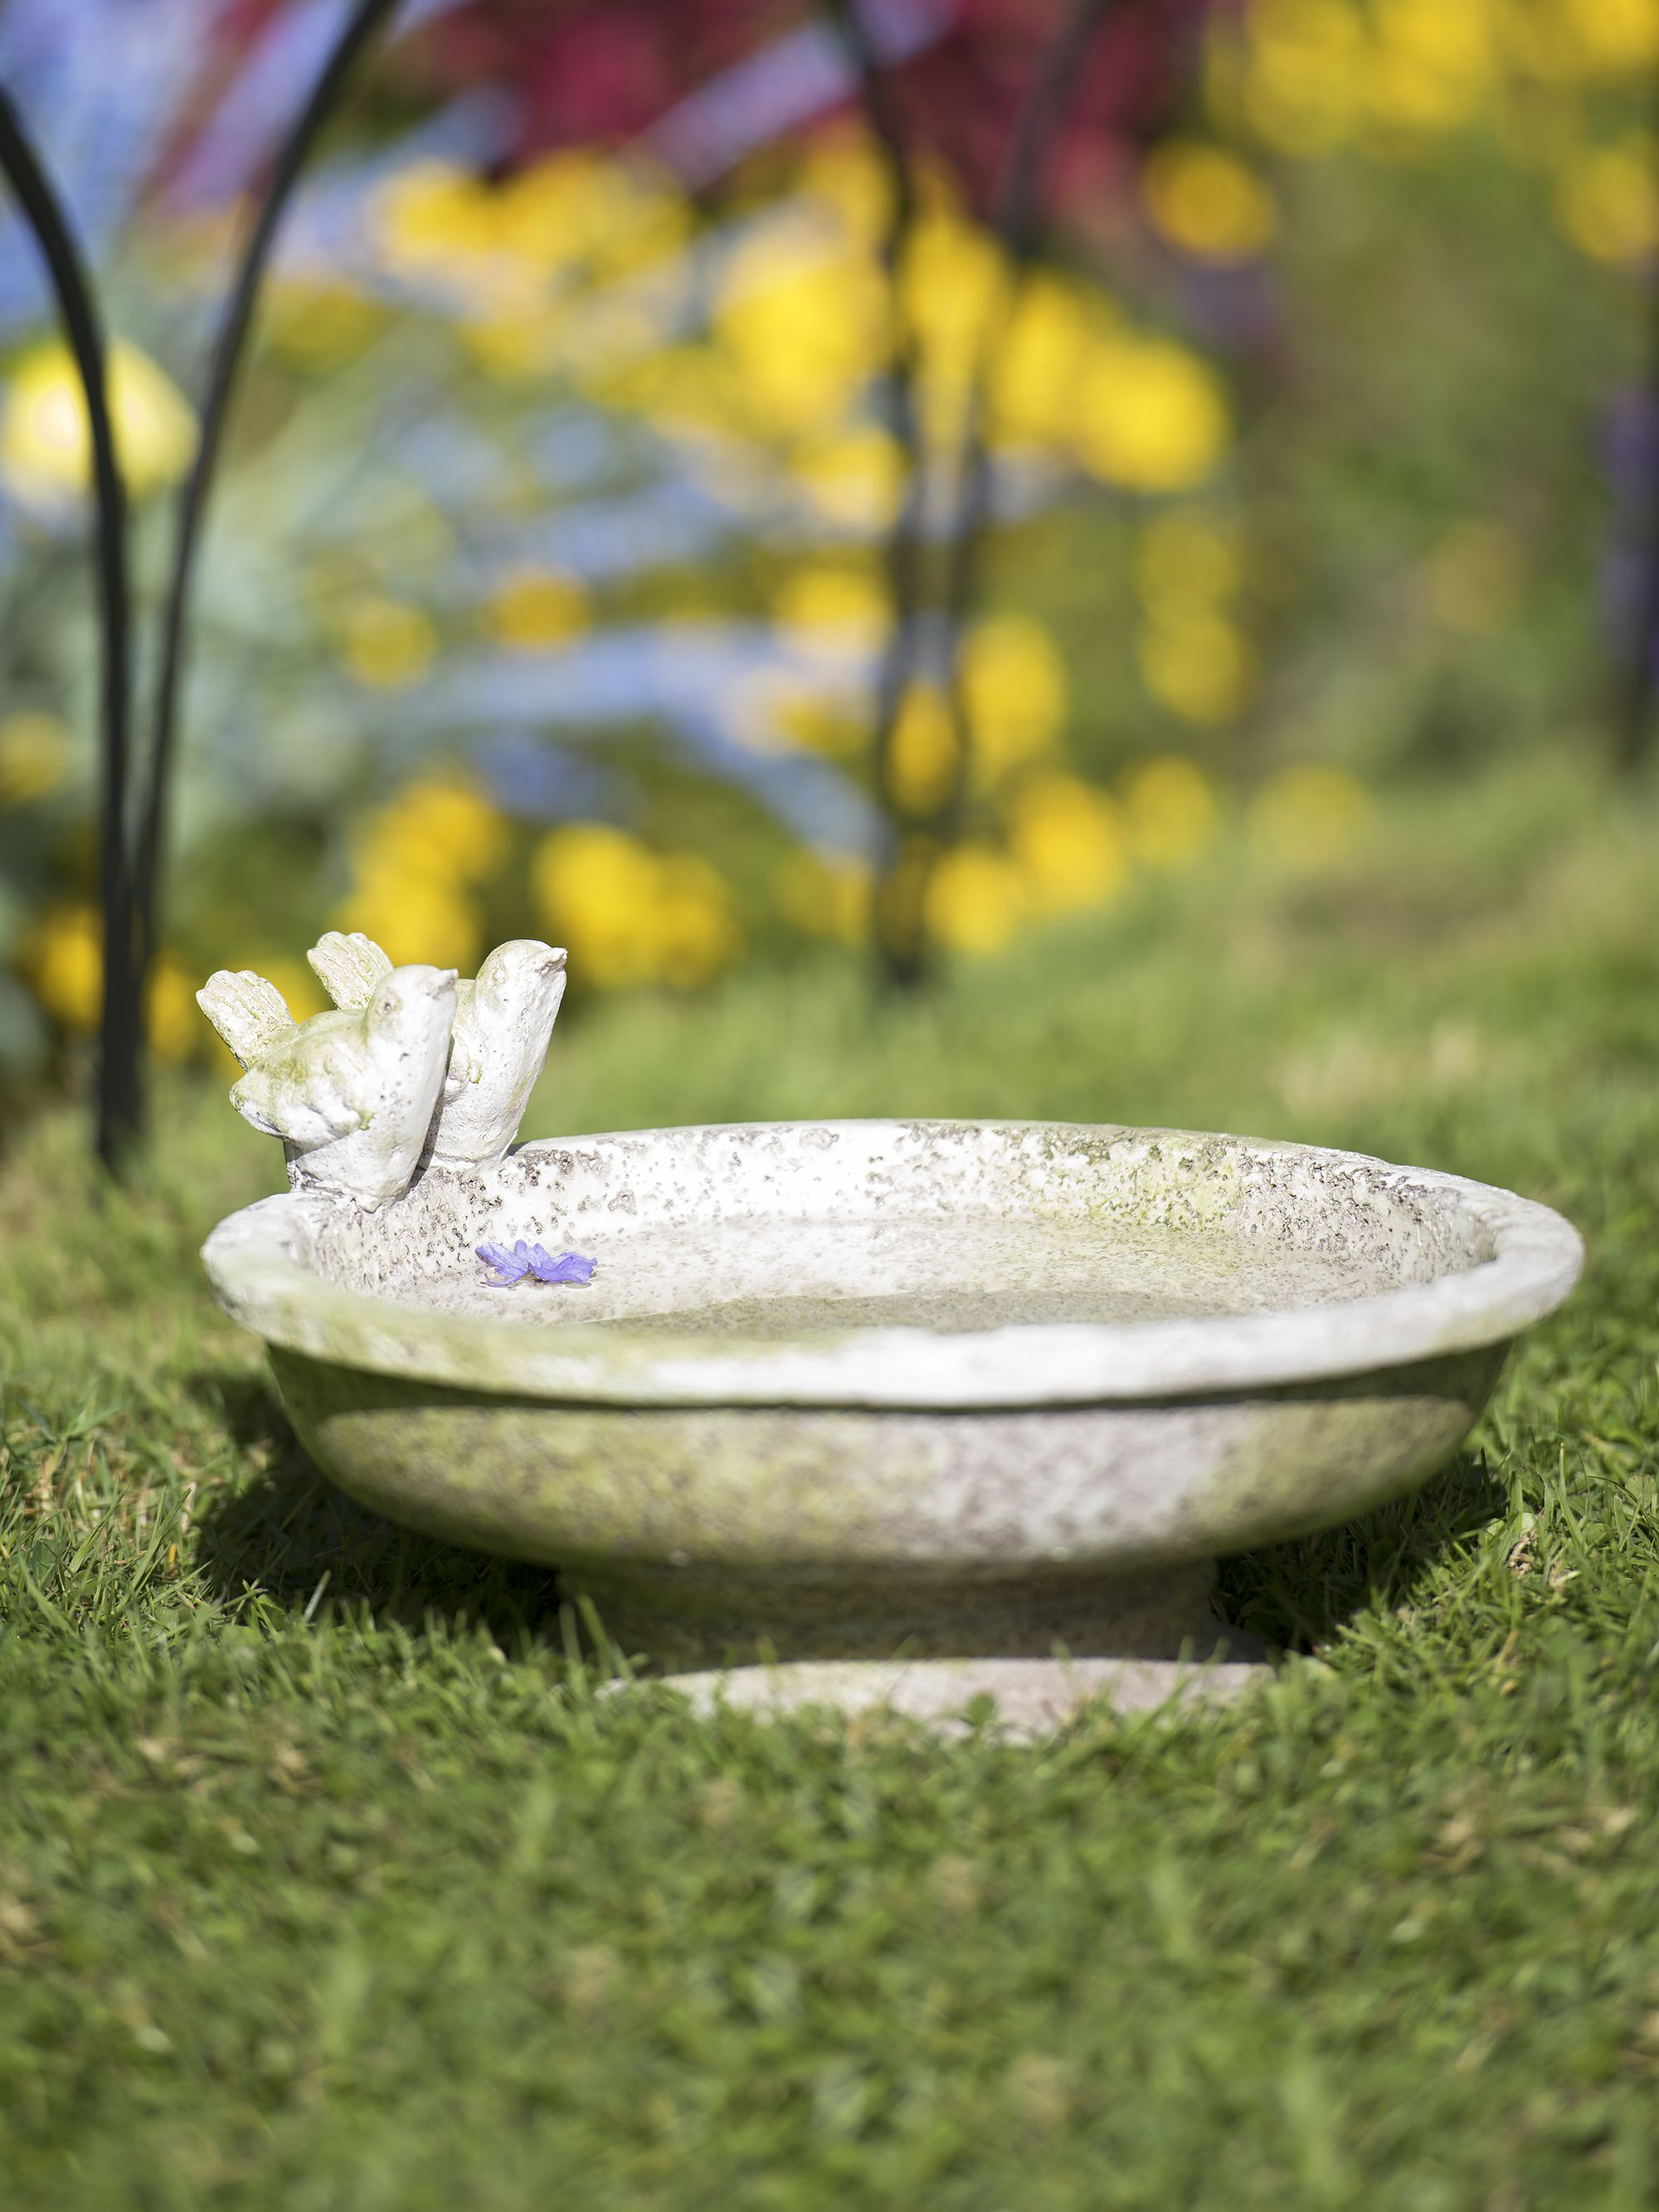 Low-Profile Bird Bath Accents Deck or Garden | Patio decor ...